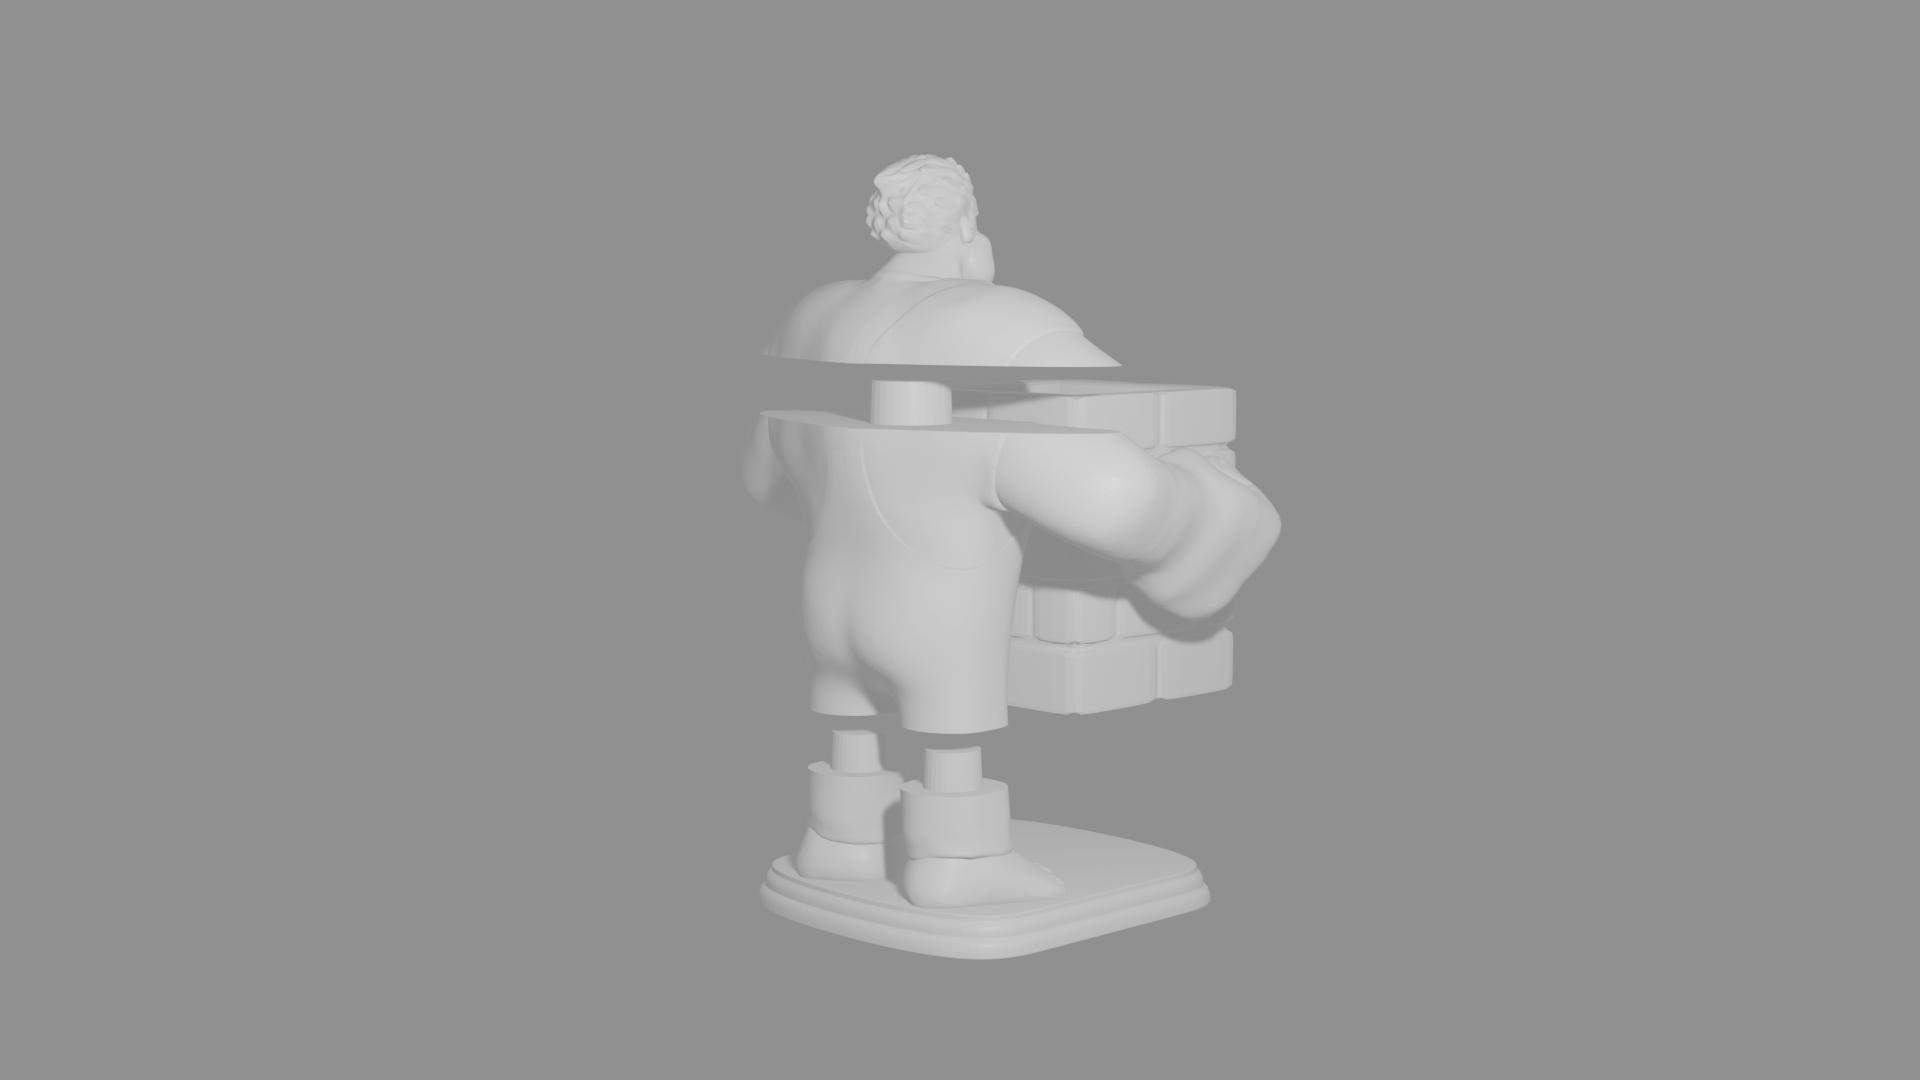 5 ralph.png Download free STL file Ralph the Feather Wrecker • 3D printer design, Aslan3d